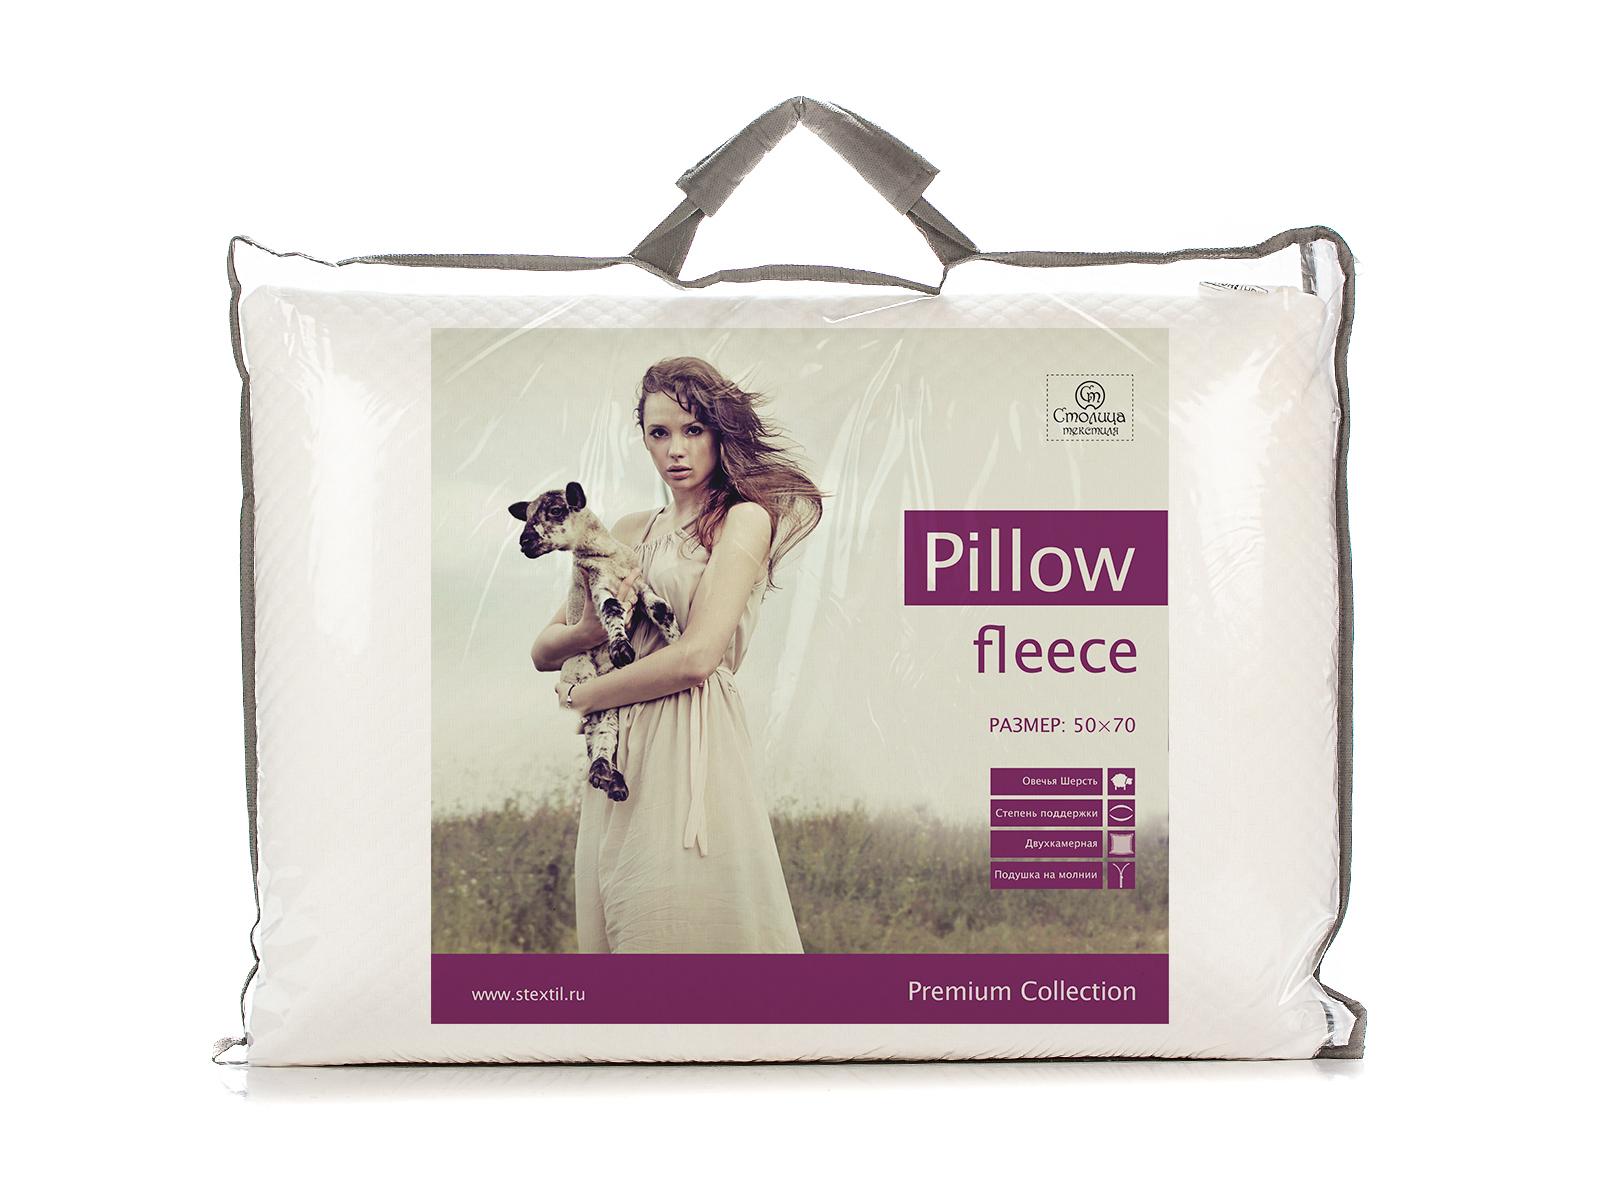 Дизайн упаковки для подушки